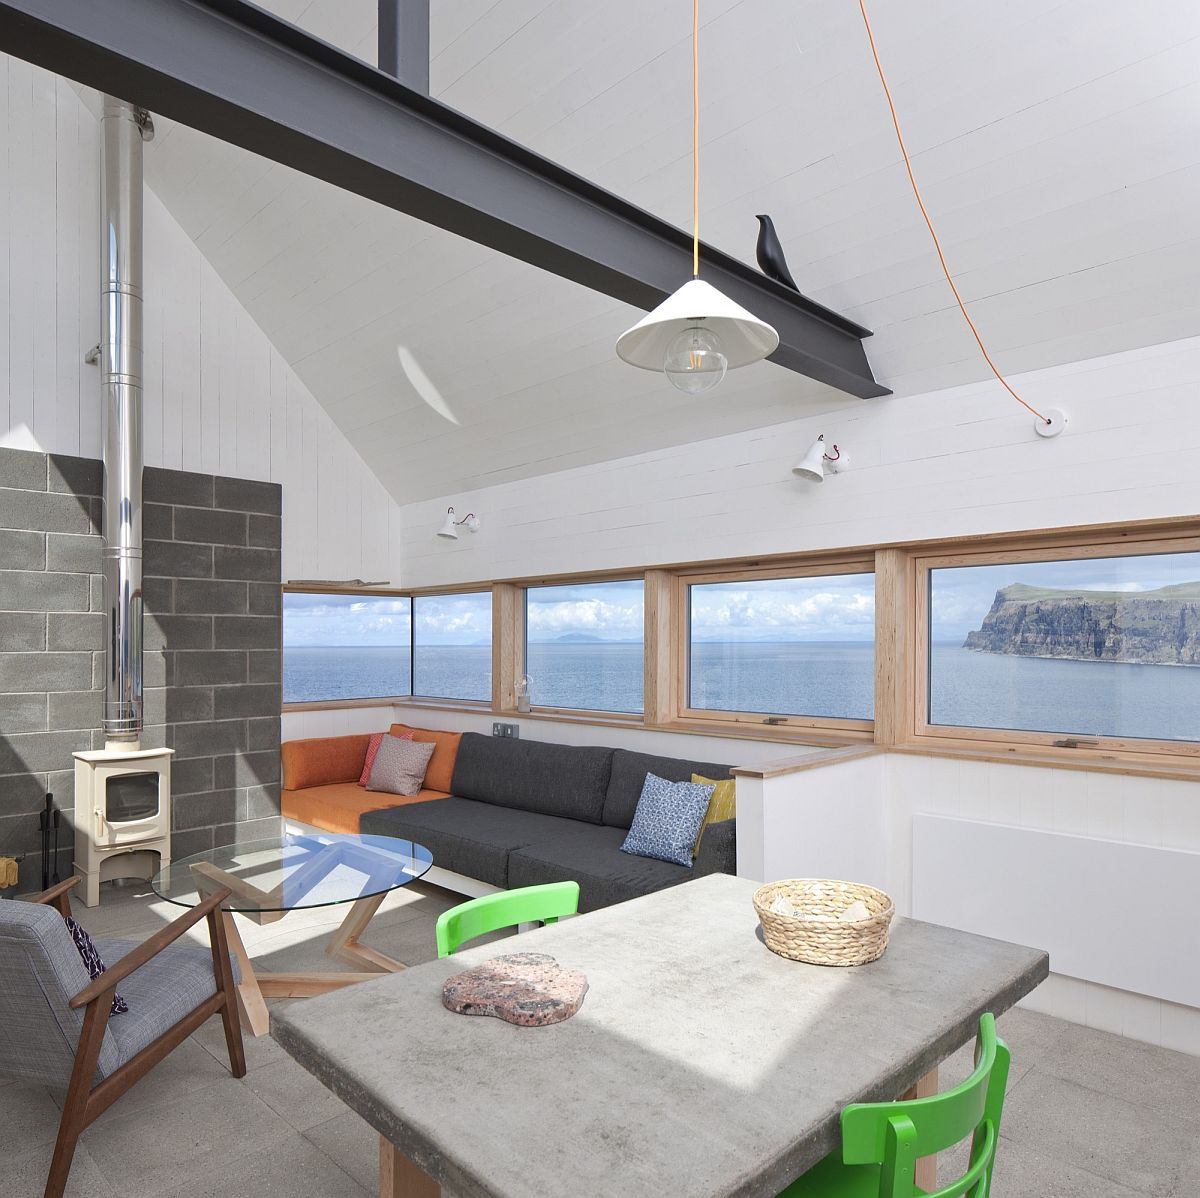 Tinhouse Rural Design: Serene Residence On Isle Of Skye Blends Rural And Modern